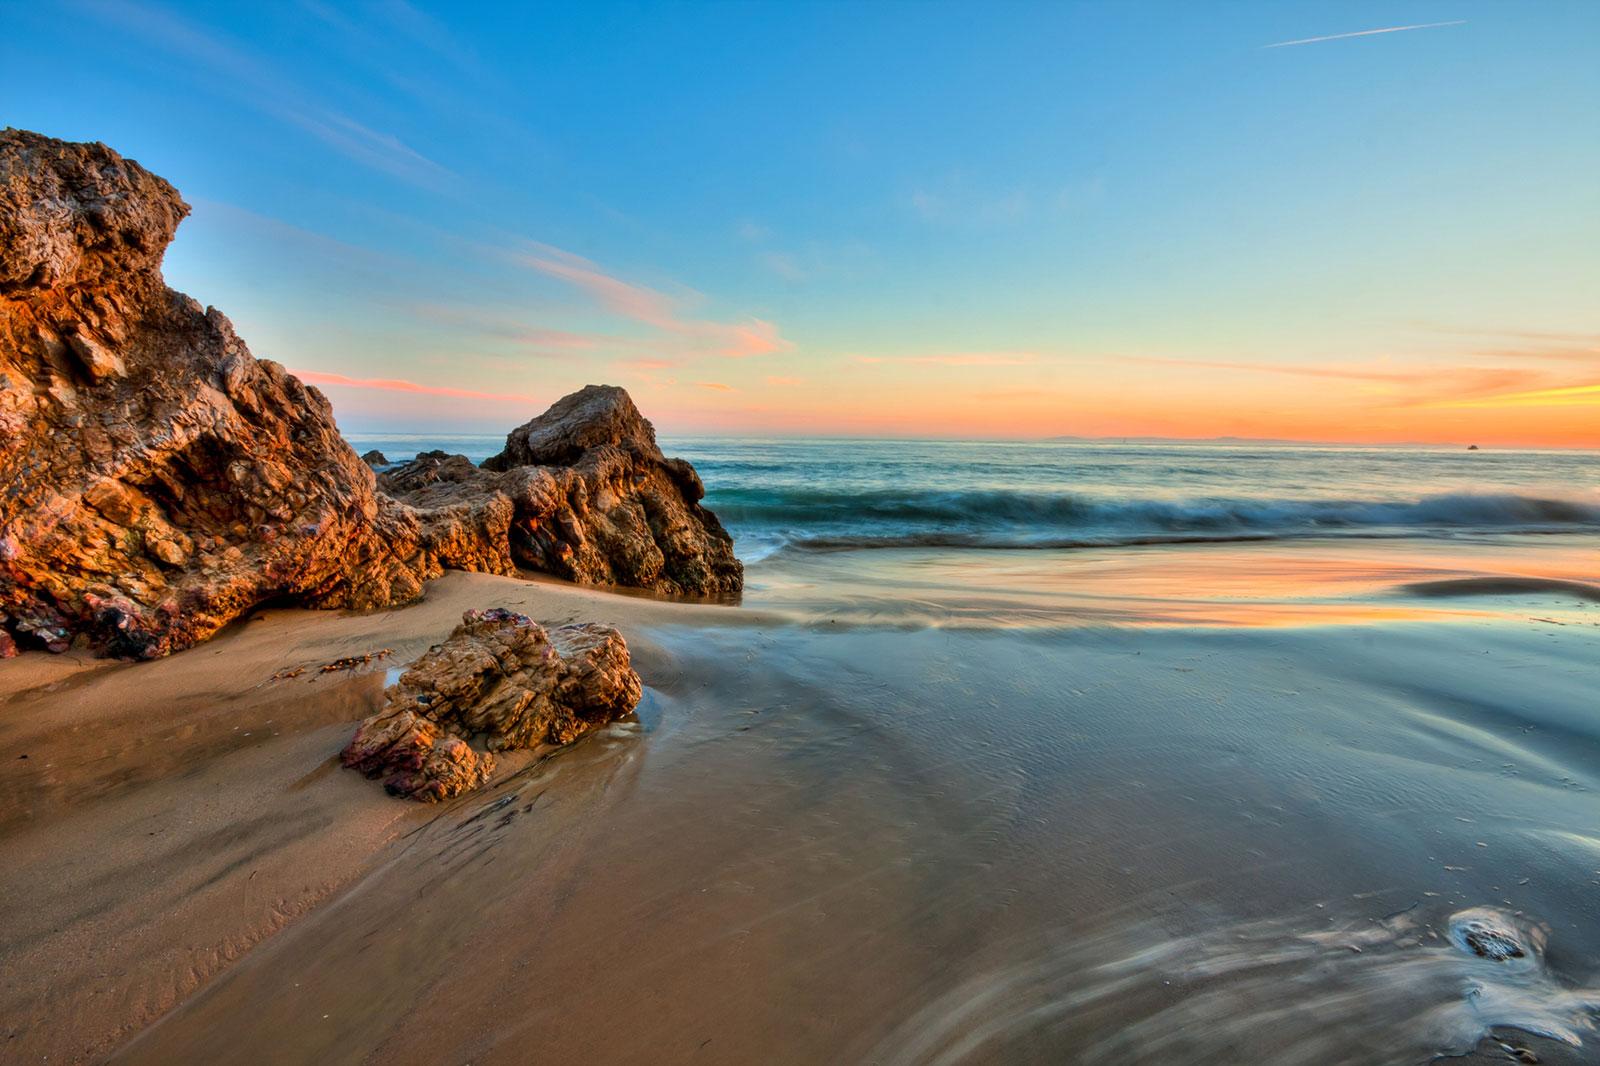 Image of a coastline.